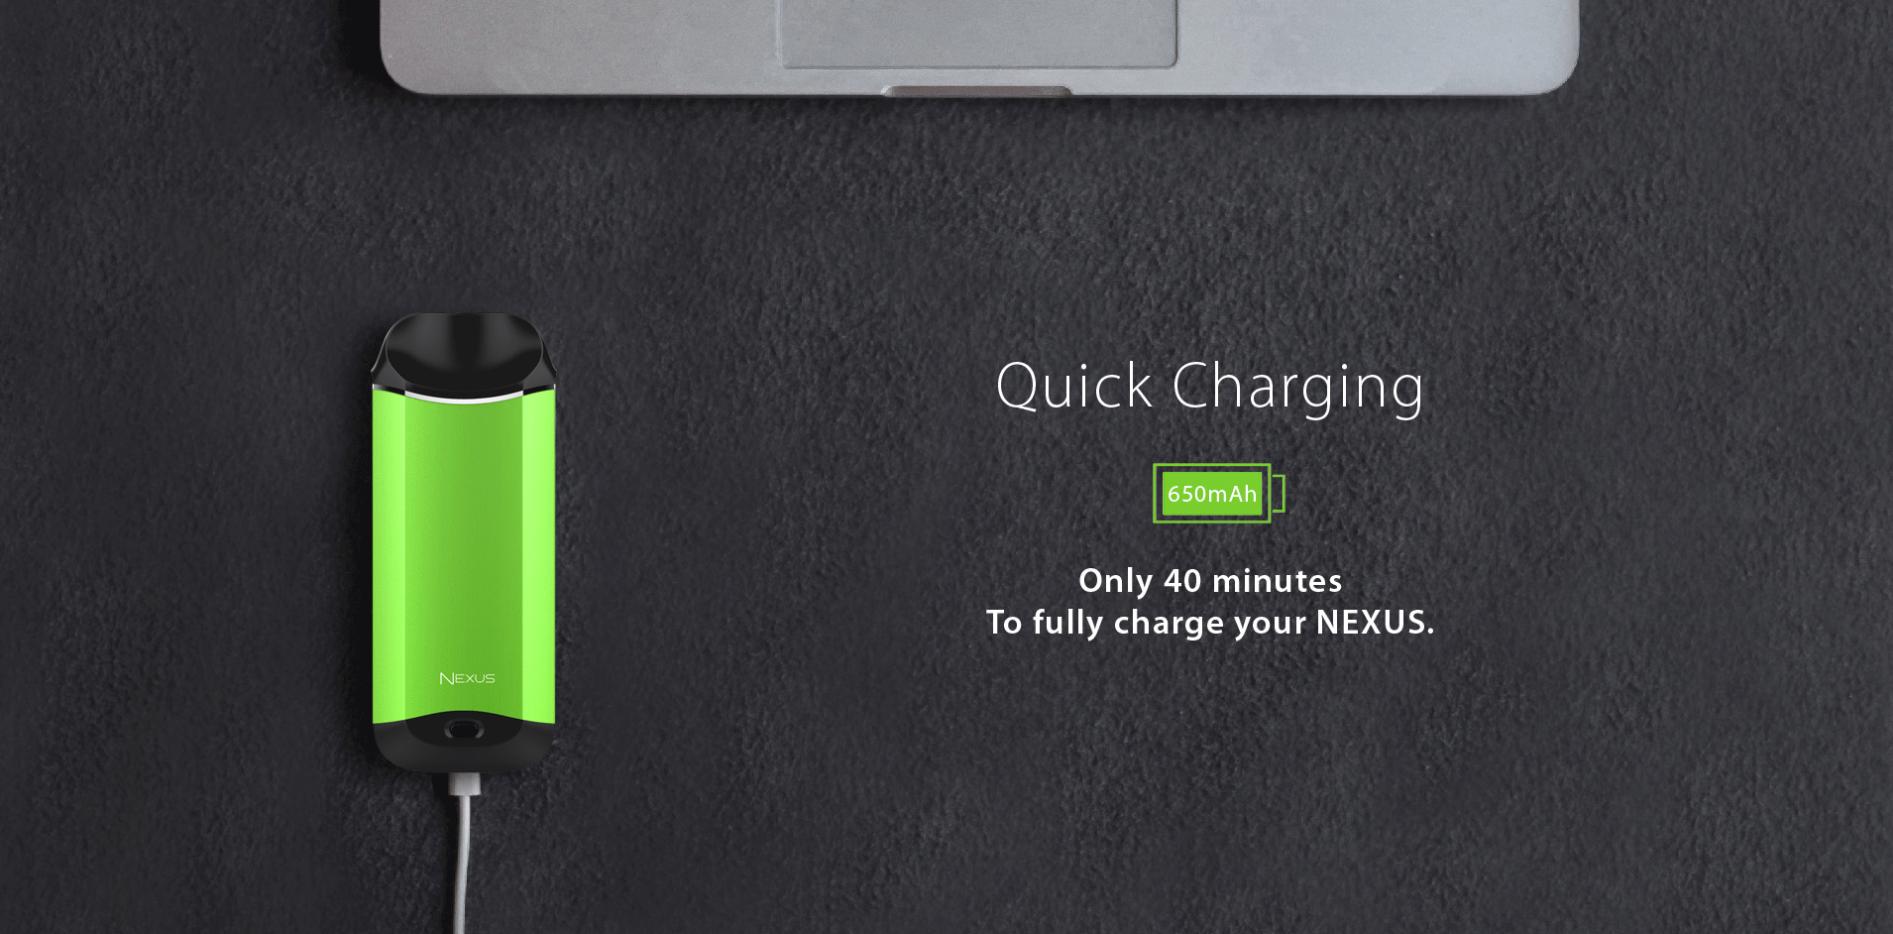 Vaporesso Nexus kopen, Vaporesso Nexus kopen Belgie, Vaporesso Nexus kopen Nederland, Vaporesso Nexus Belgie, Vaporesso Nexus Nederland, Nexus Kit